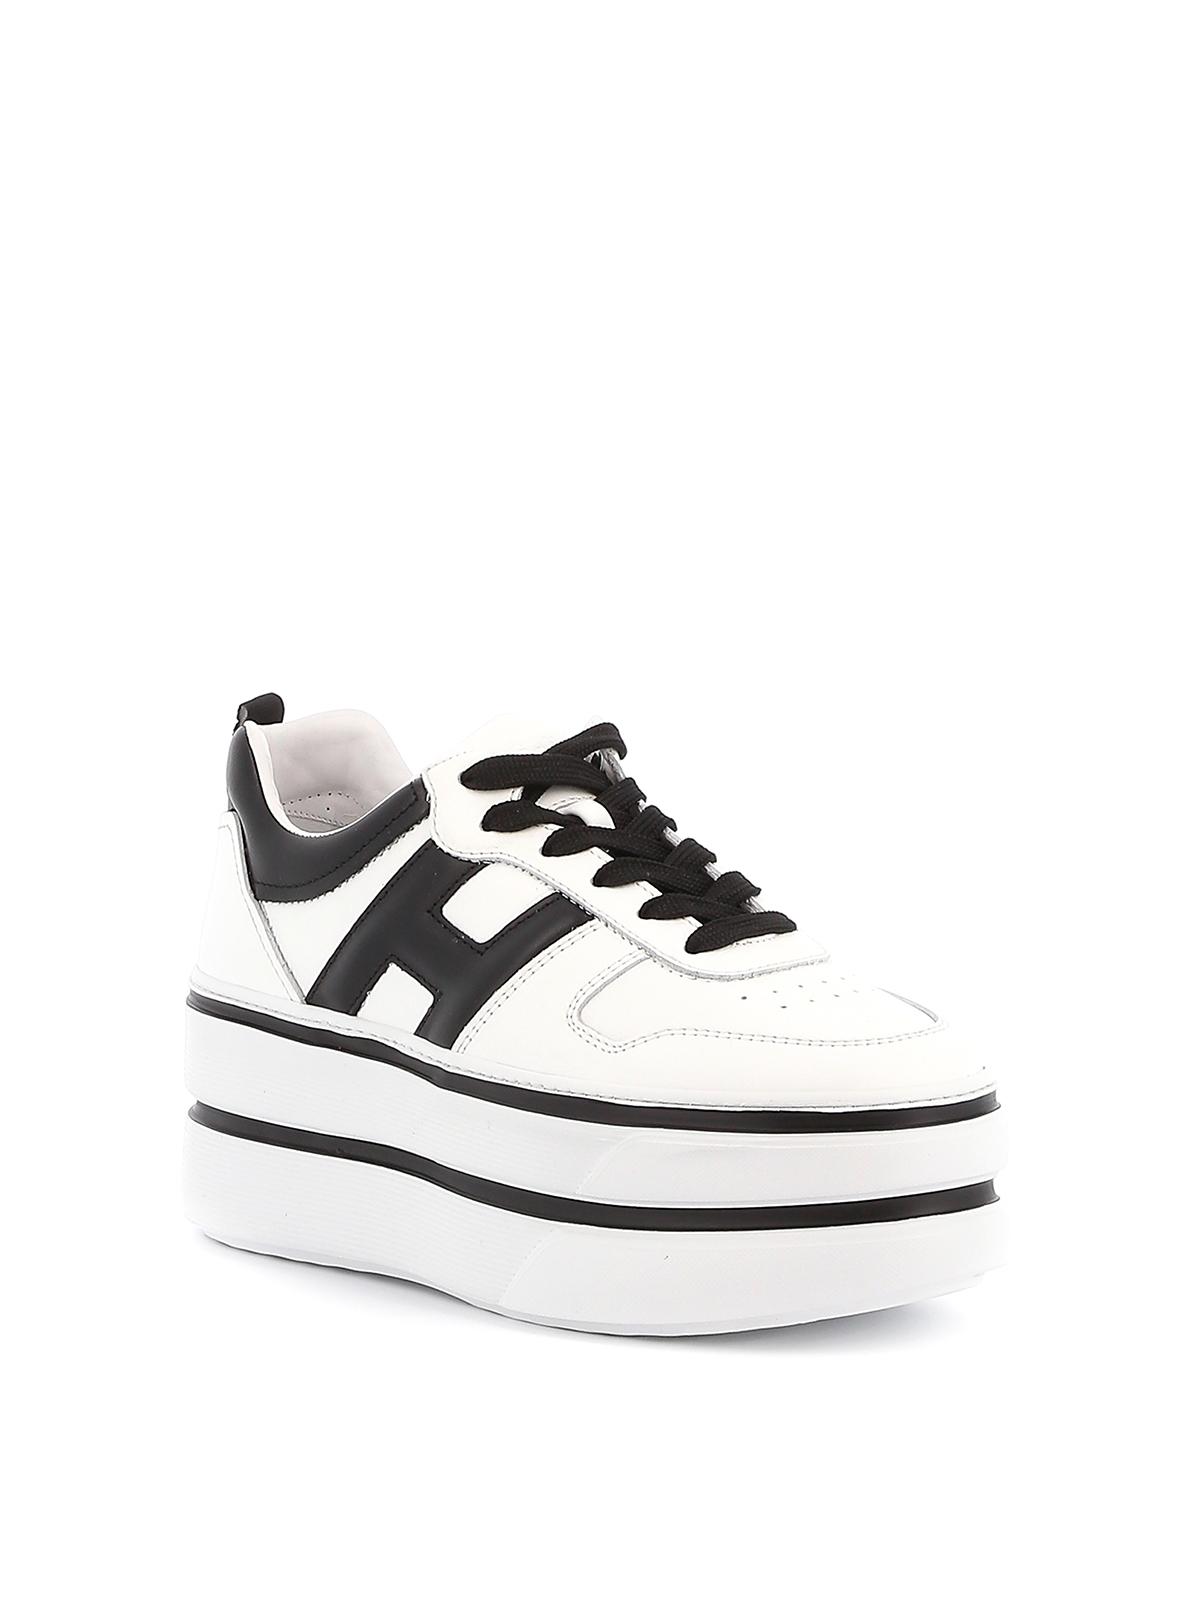 Hogan - H449 bicolour sneakers - trainers - HXW4490BS00KLA0001 ...